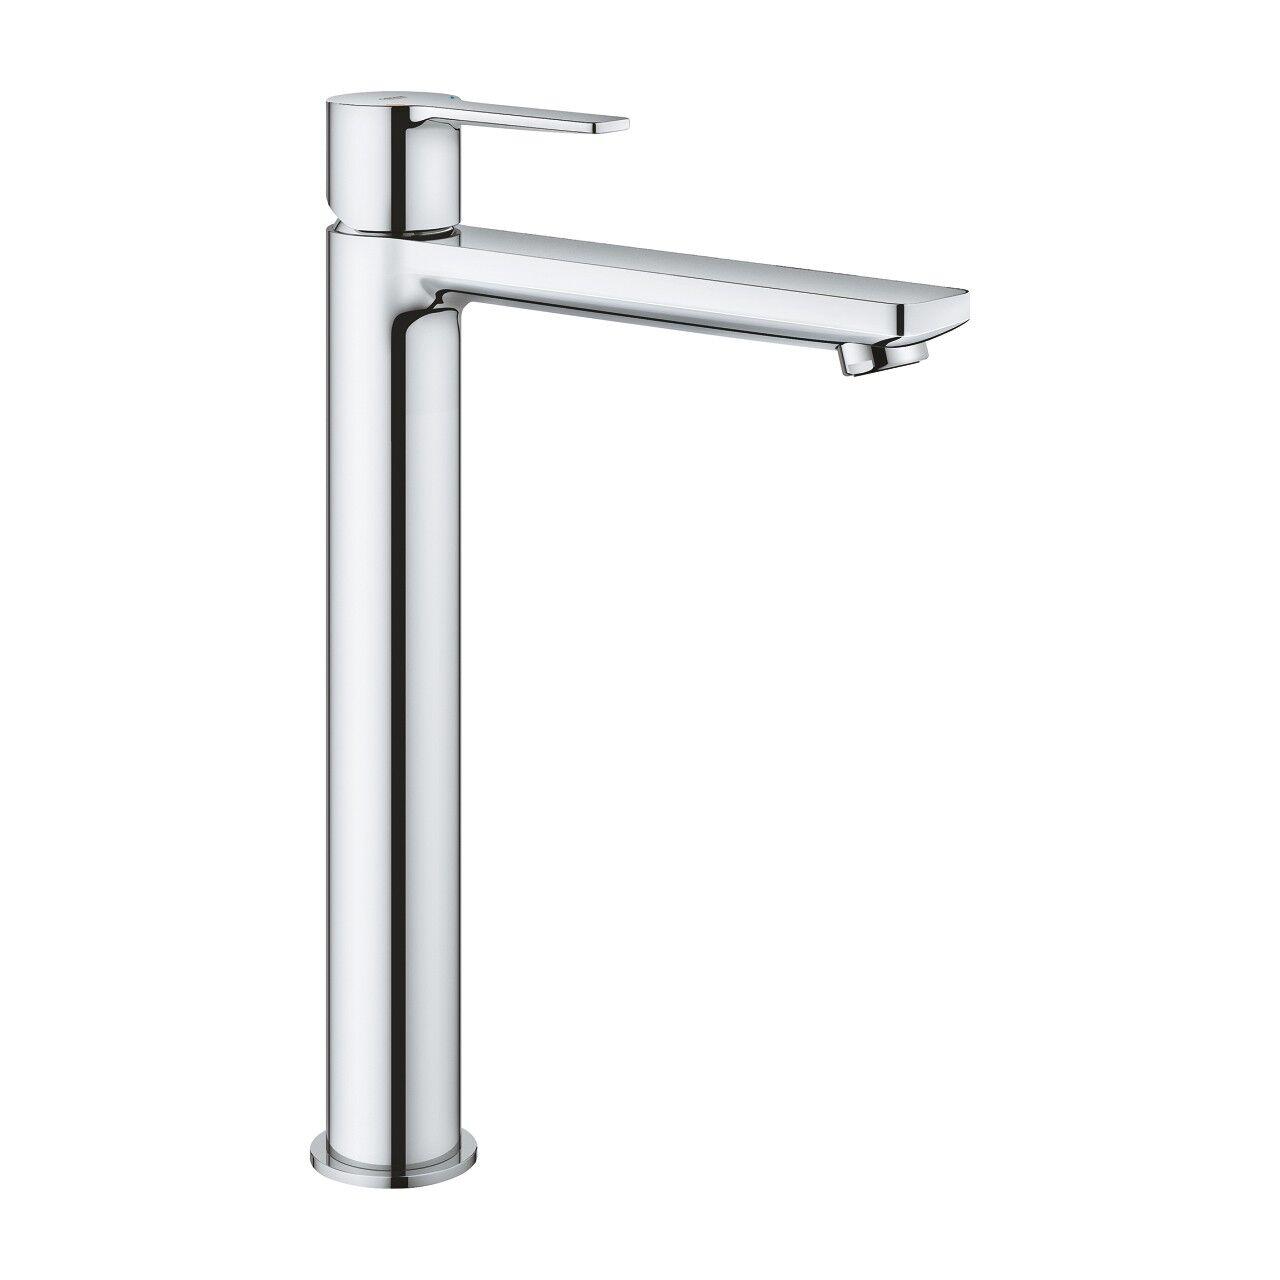 CAESAROO Grohe Lineare Mitigeur monocommande XL pour lavabo 23405001   Chromè